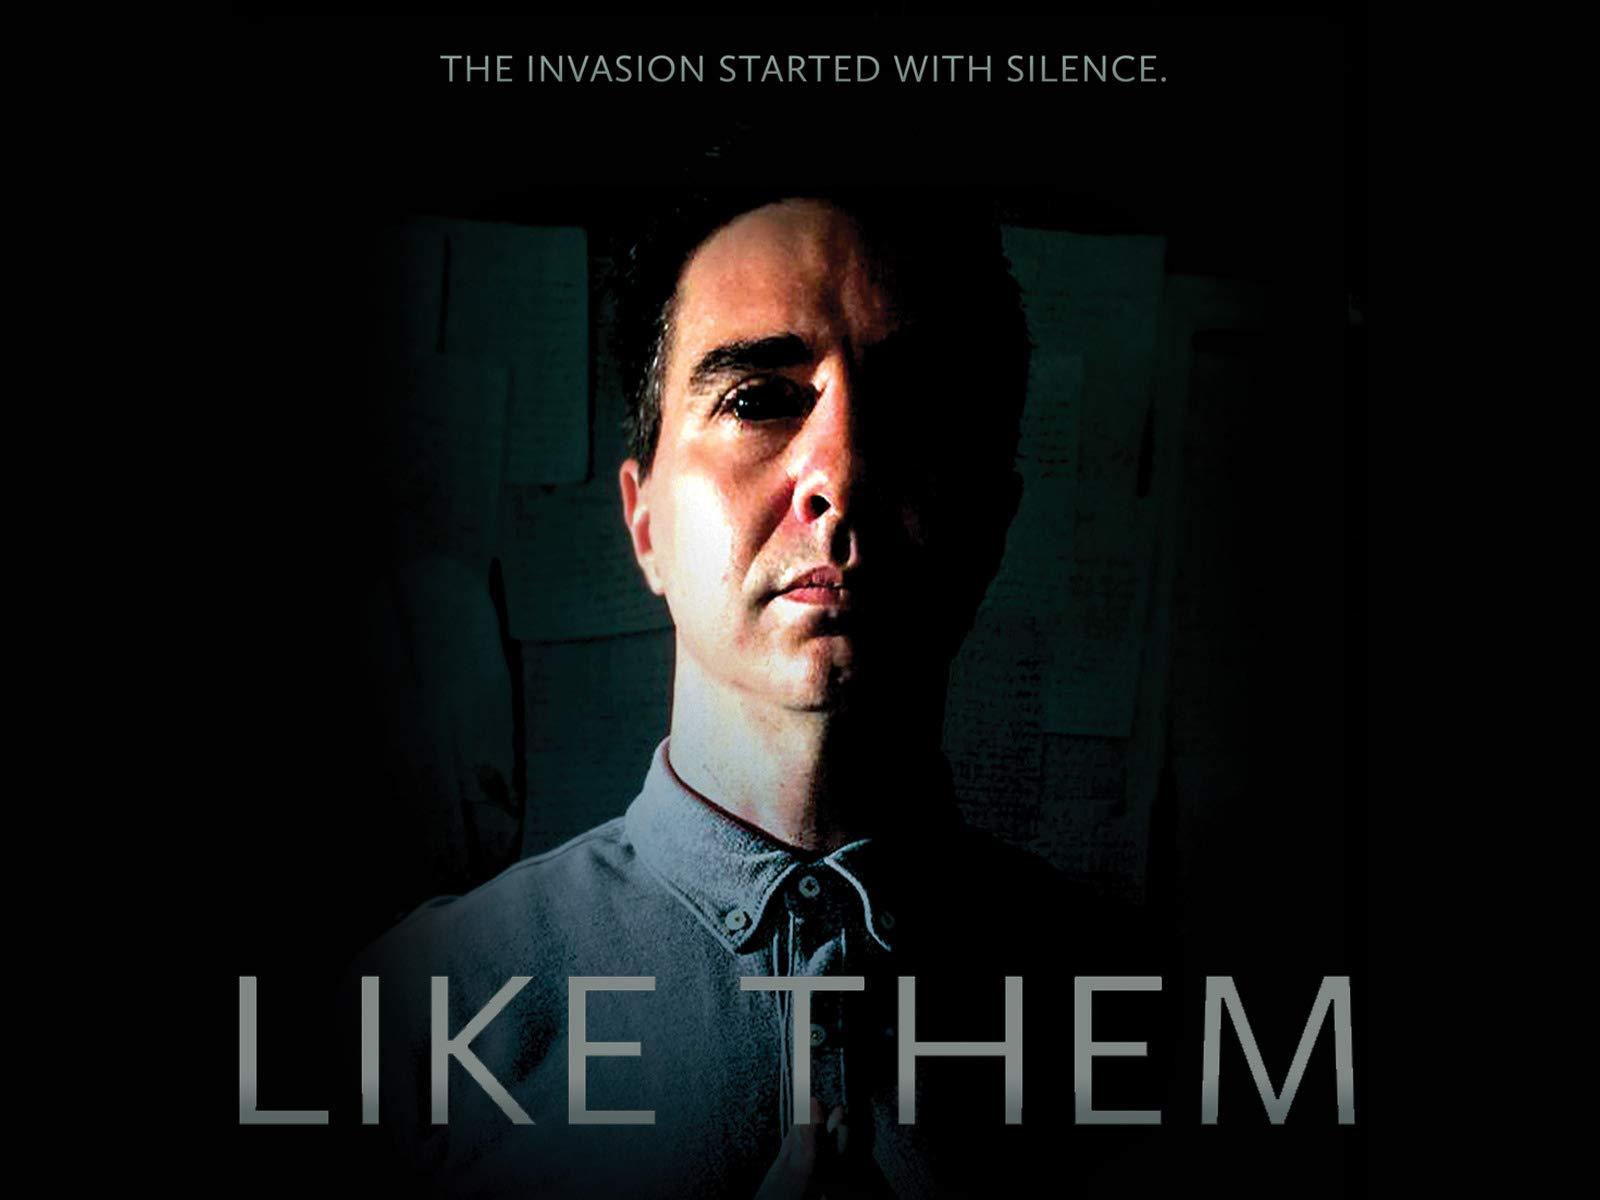 Like Them on Amazon Prime Video UK